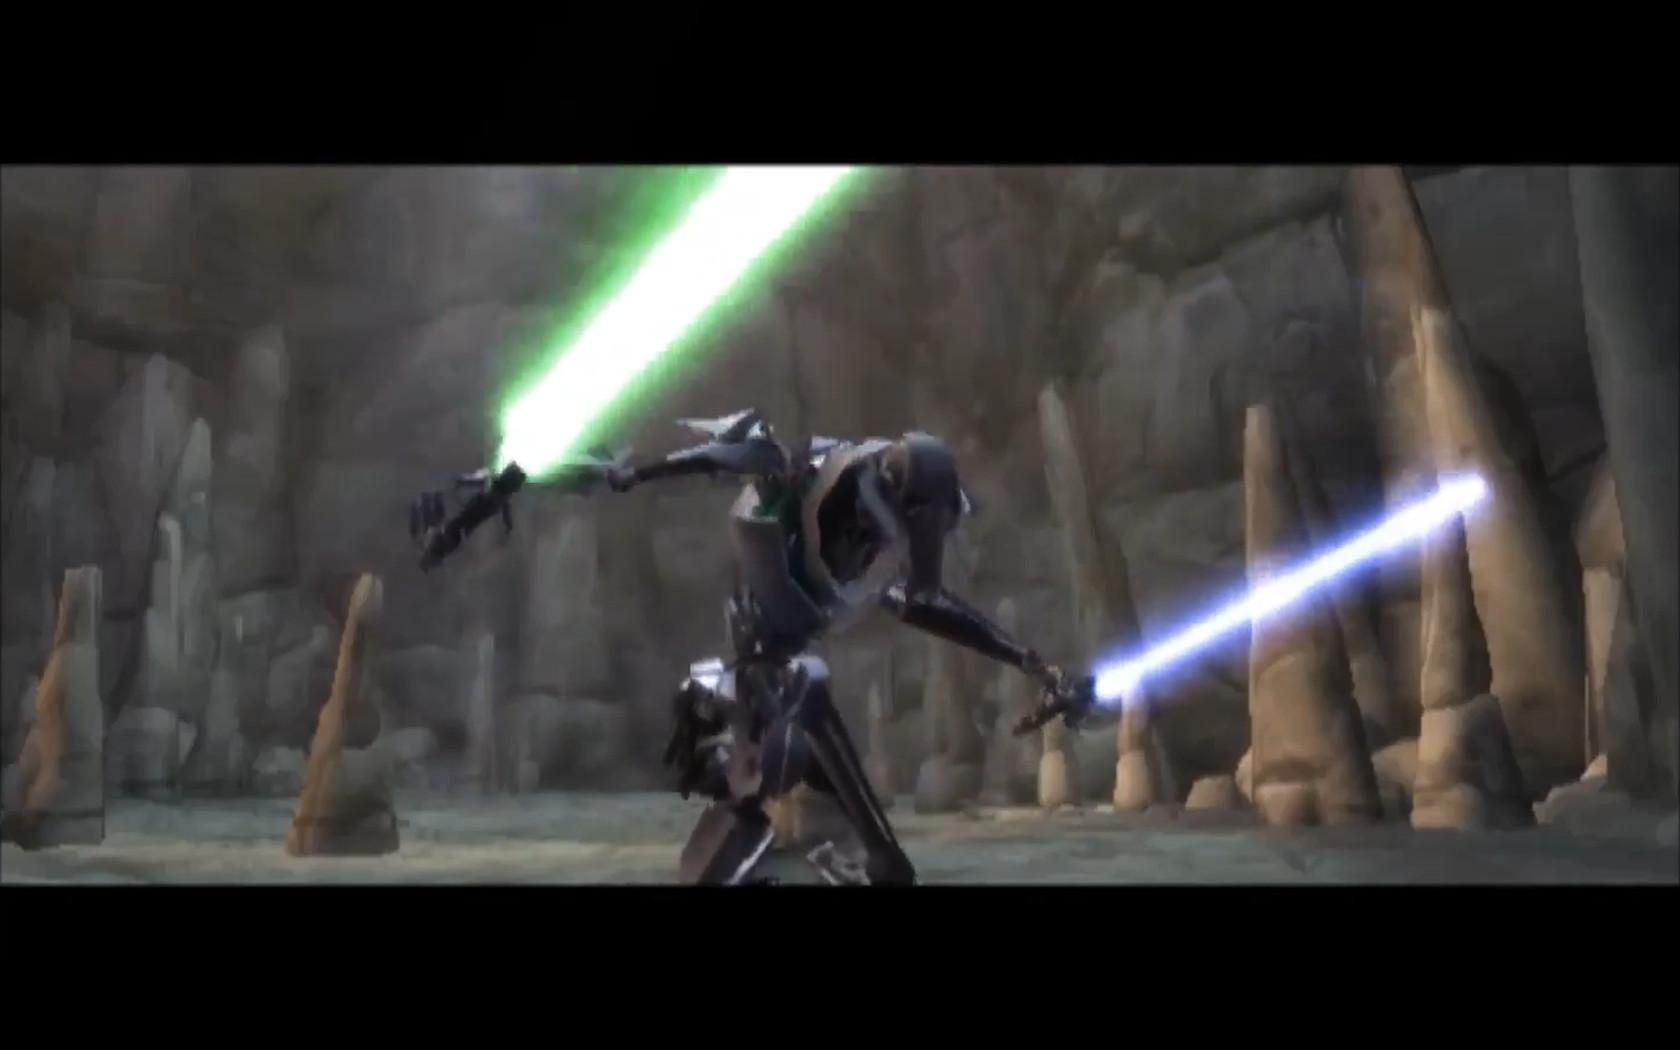 Artstation Ep Iii Revenge Of The Sith General Grievous Rig Oct 2003 Mar 2005 Daryl Smolen